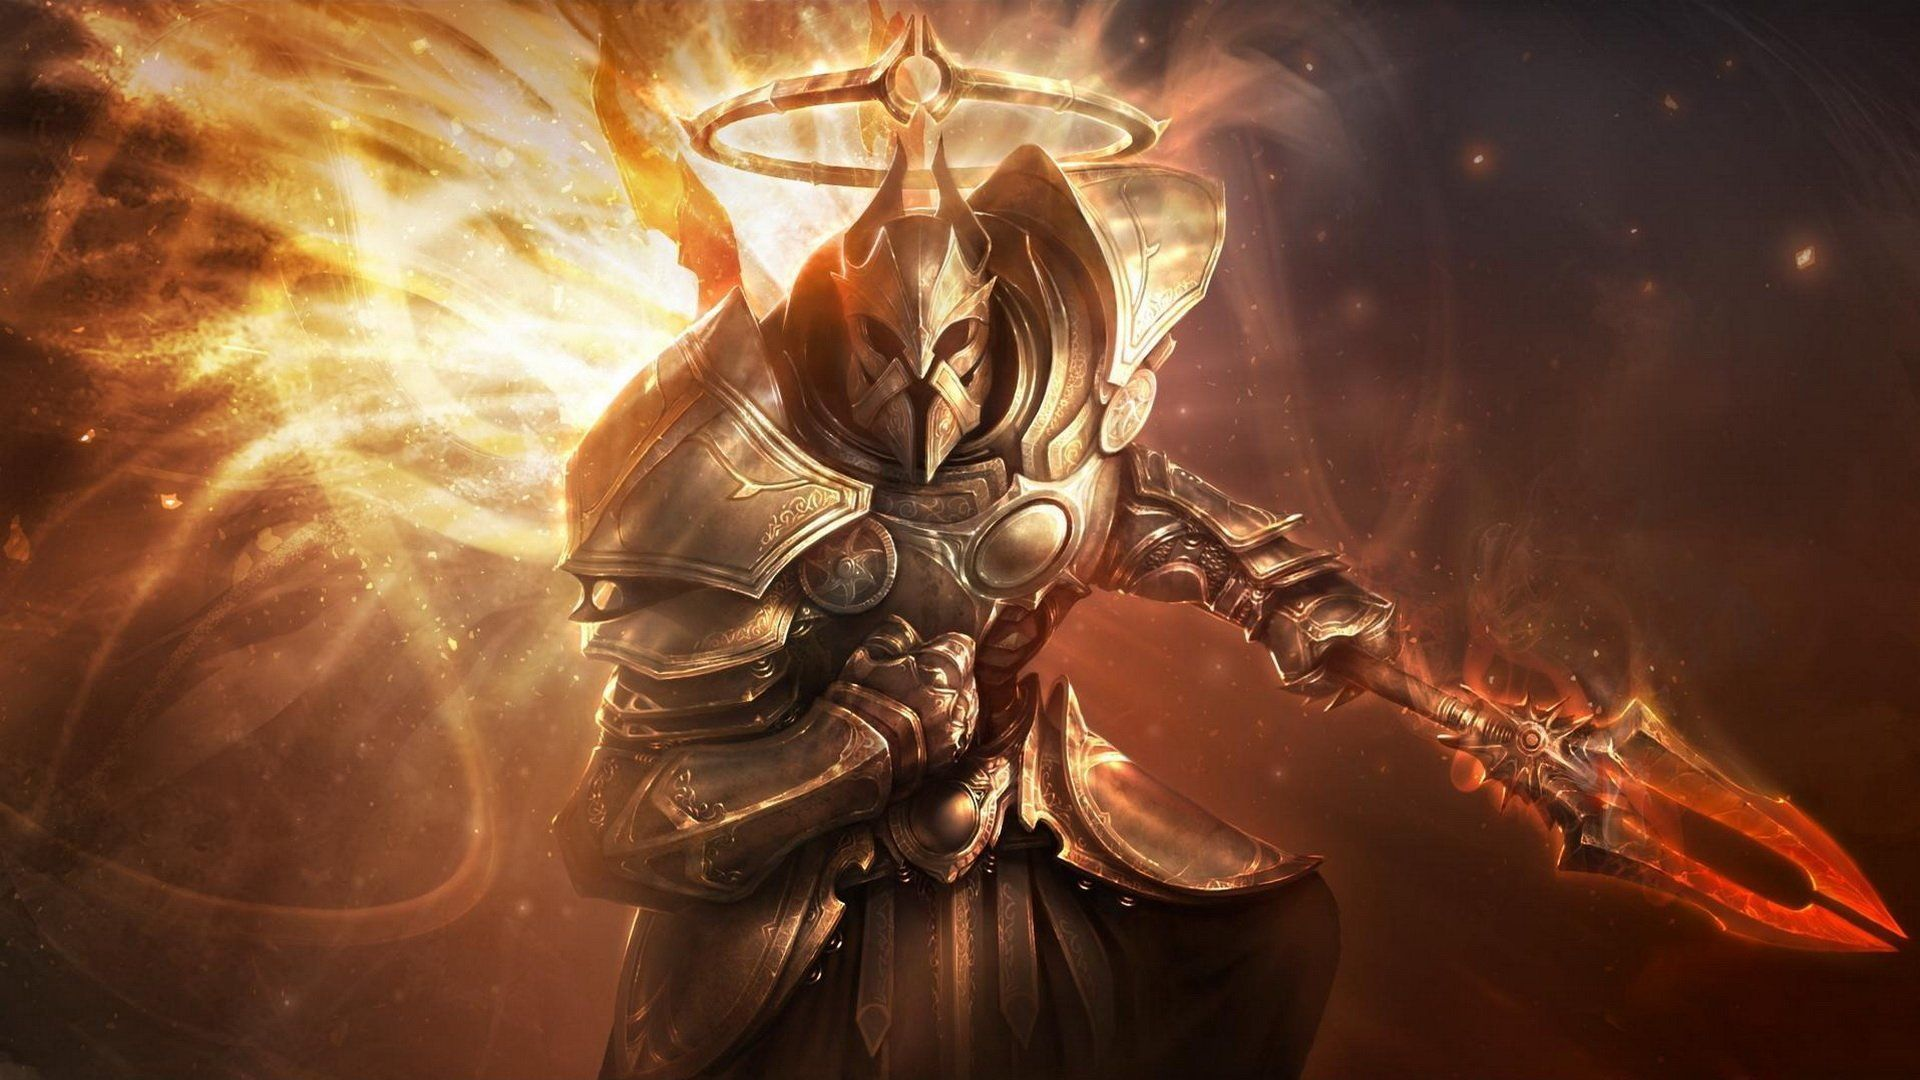 Diablo Wallpapers Top Free Diablo Backgrounds Wallpaperaccess